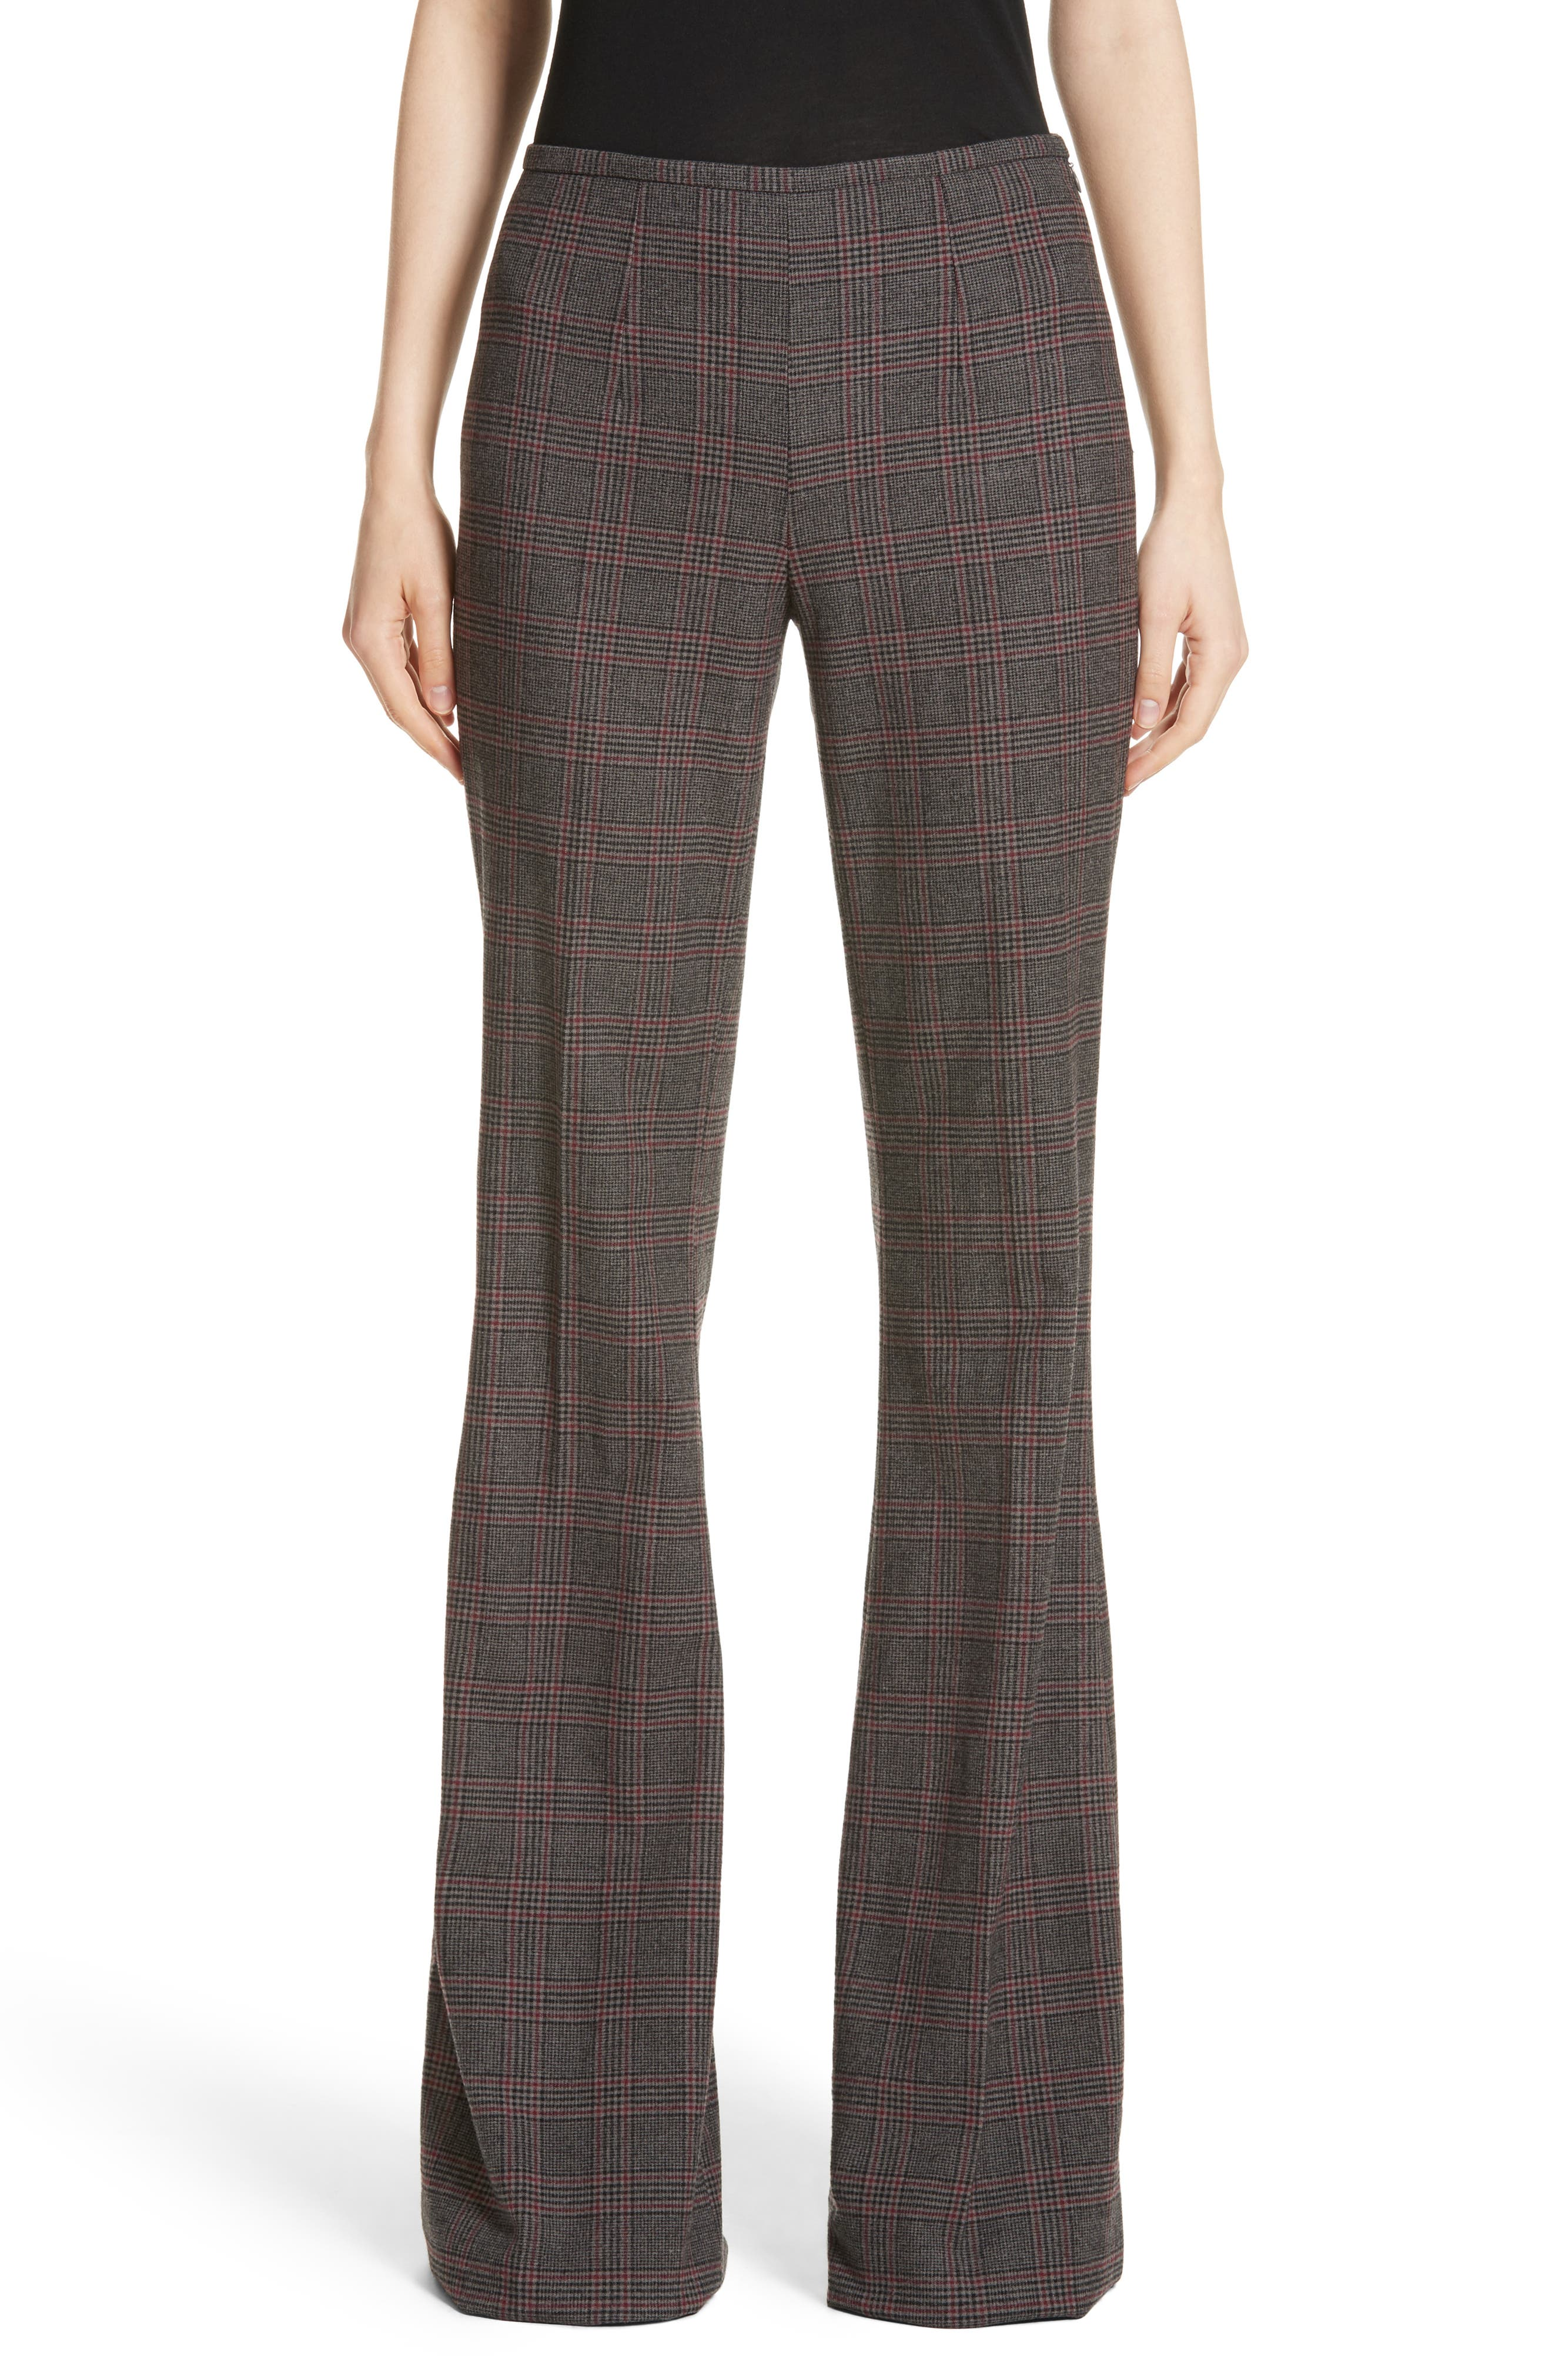 MICHAEL KORS Plaid Stretch Wool Flannel Pants, Main, color, 034